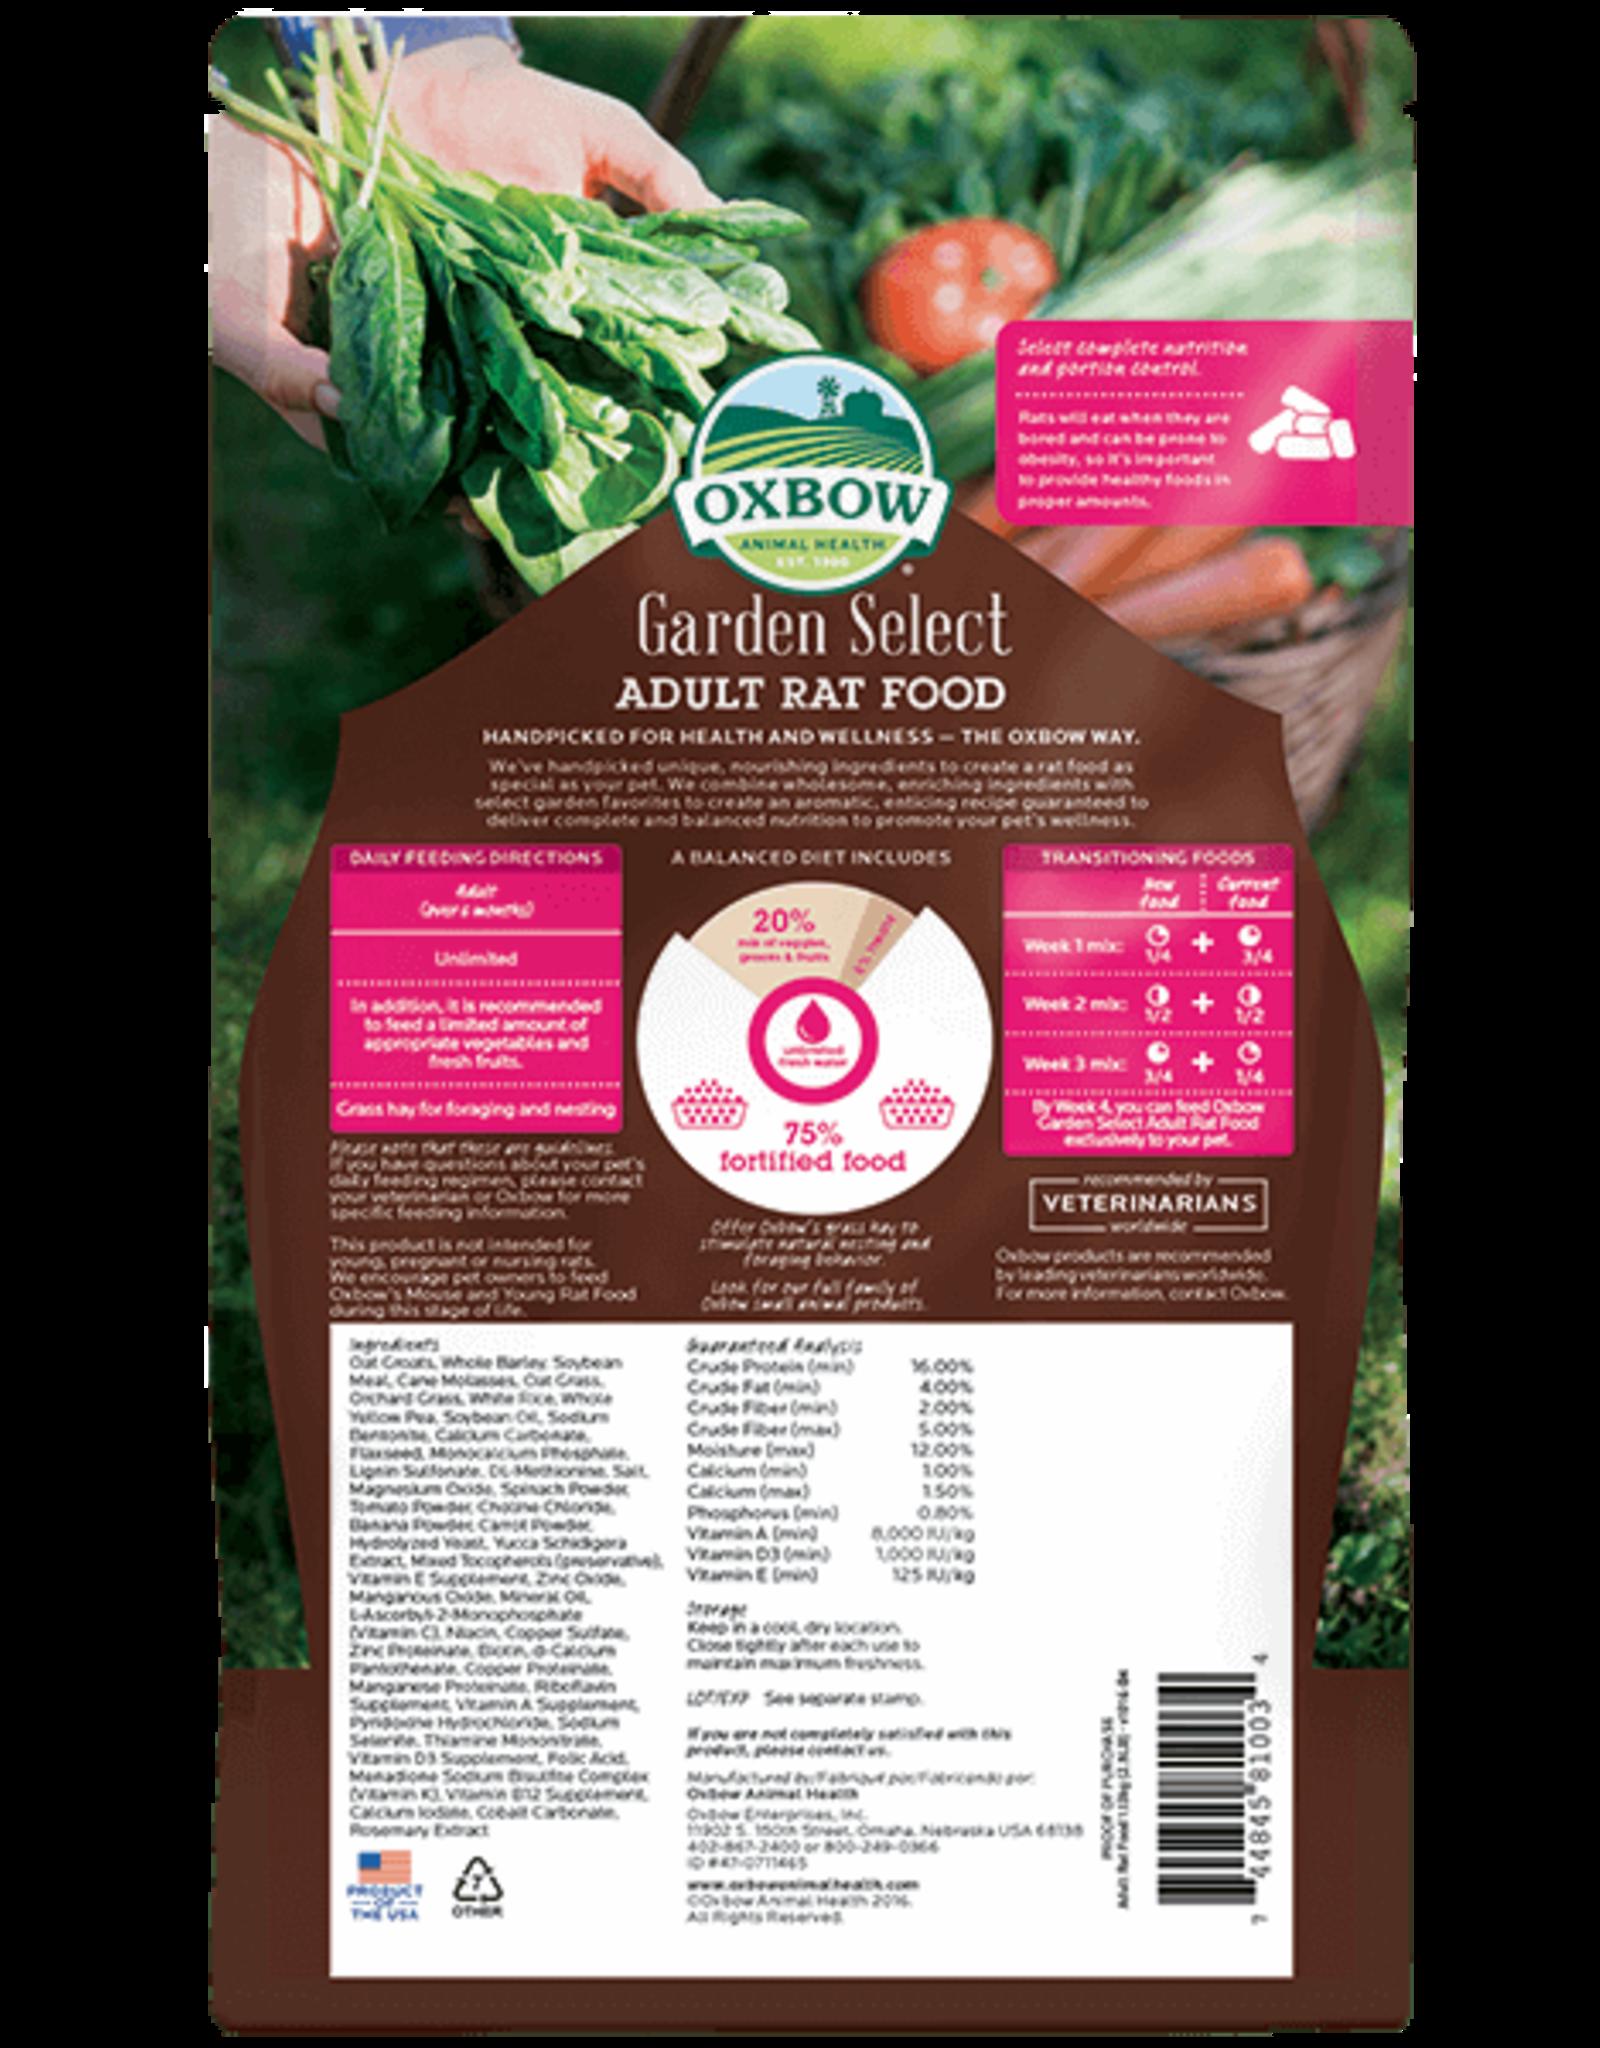 Oxbow OXBOW Garden Select Adult Rat Food 2.5 pound Bag